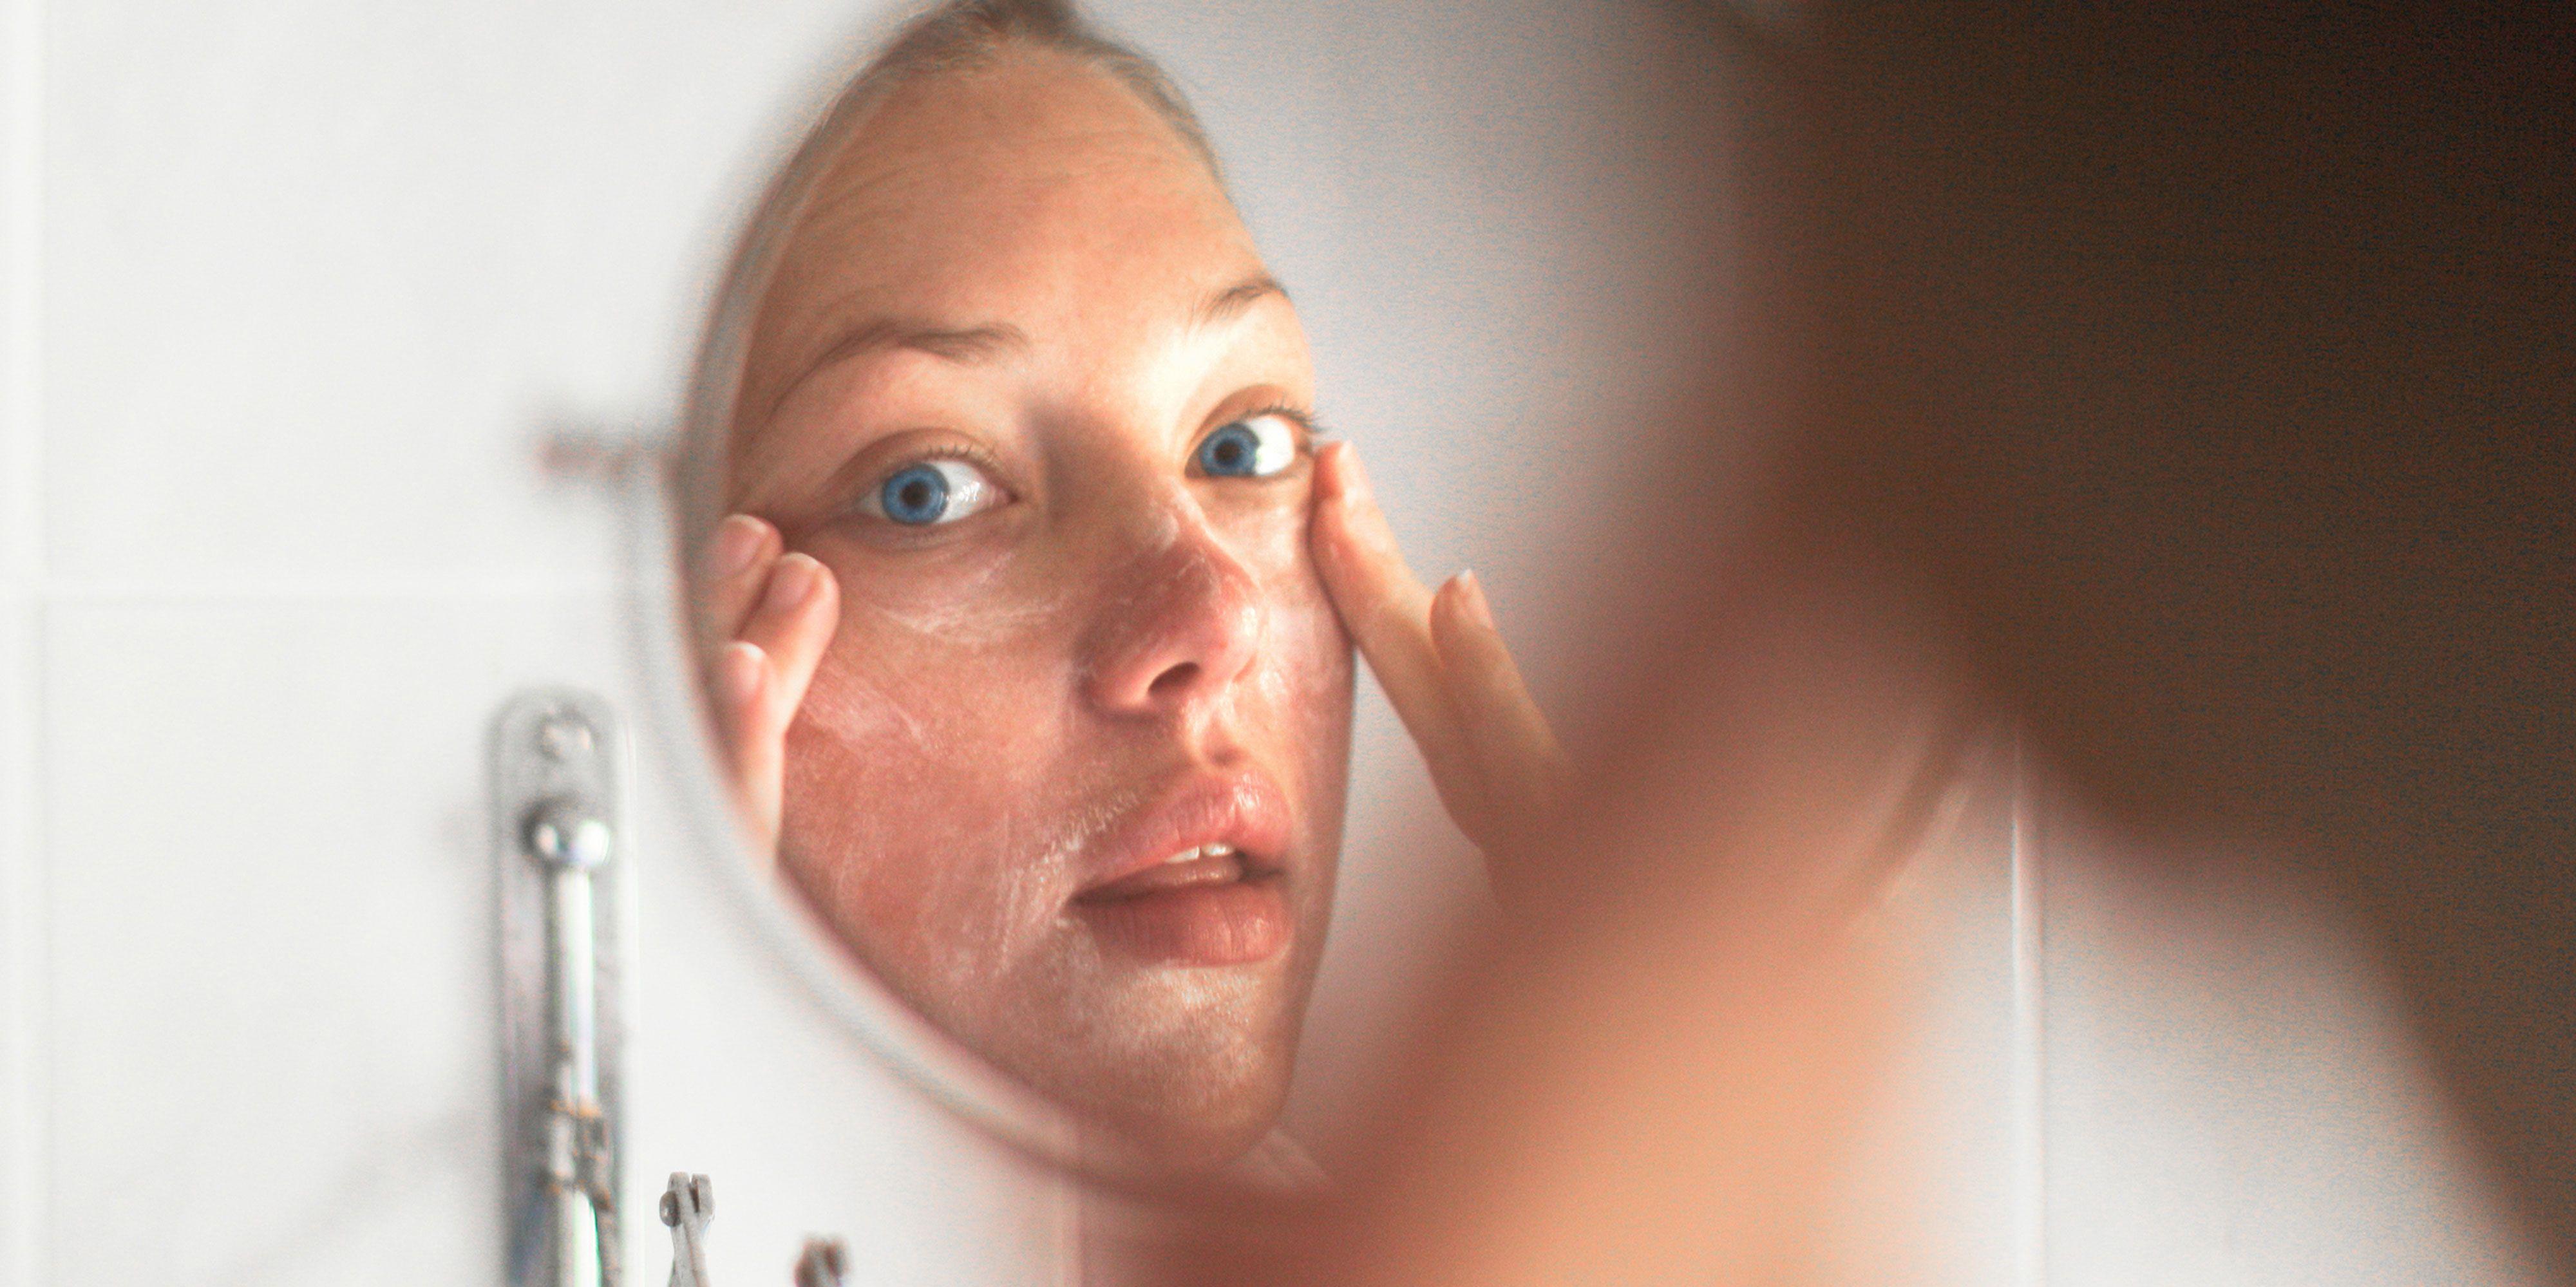 OFELIA: Acne adult care skin